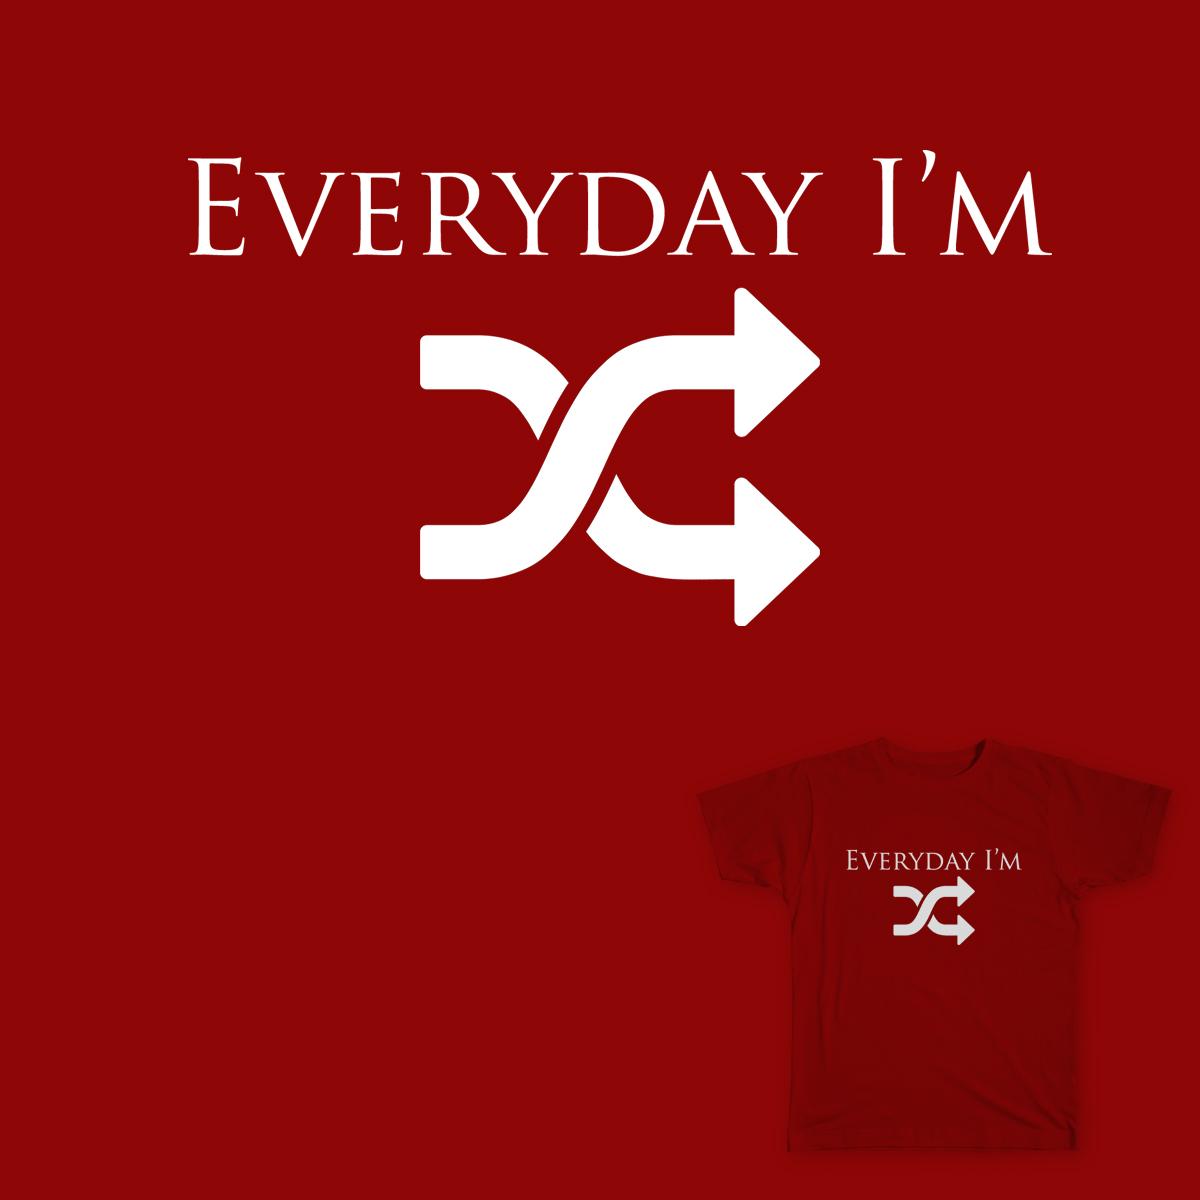 Everyday I'm shuffling ! by jackolis on Threadless